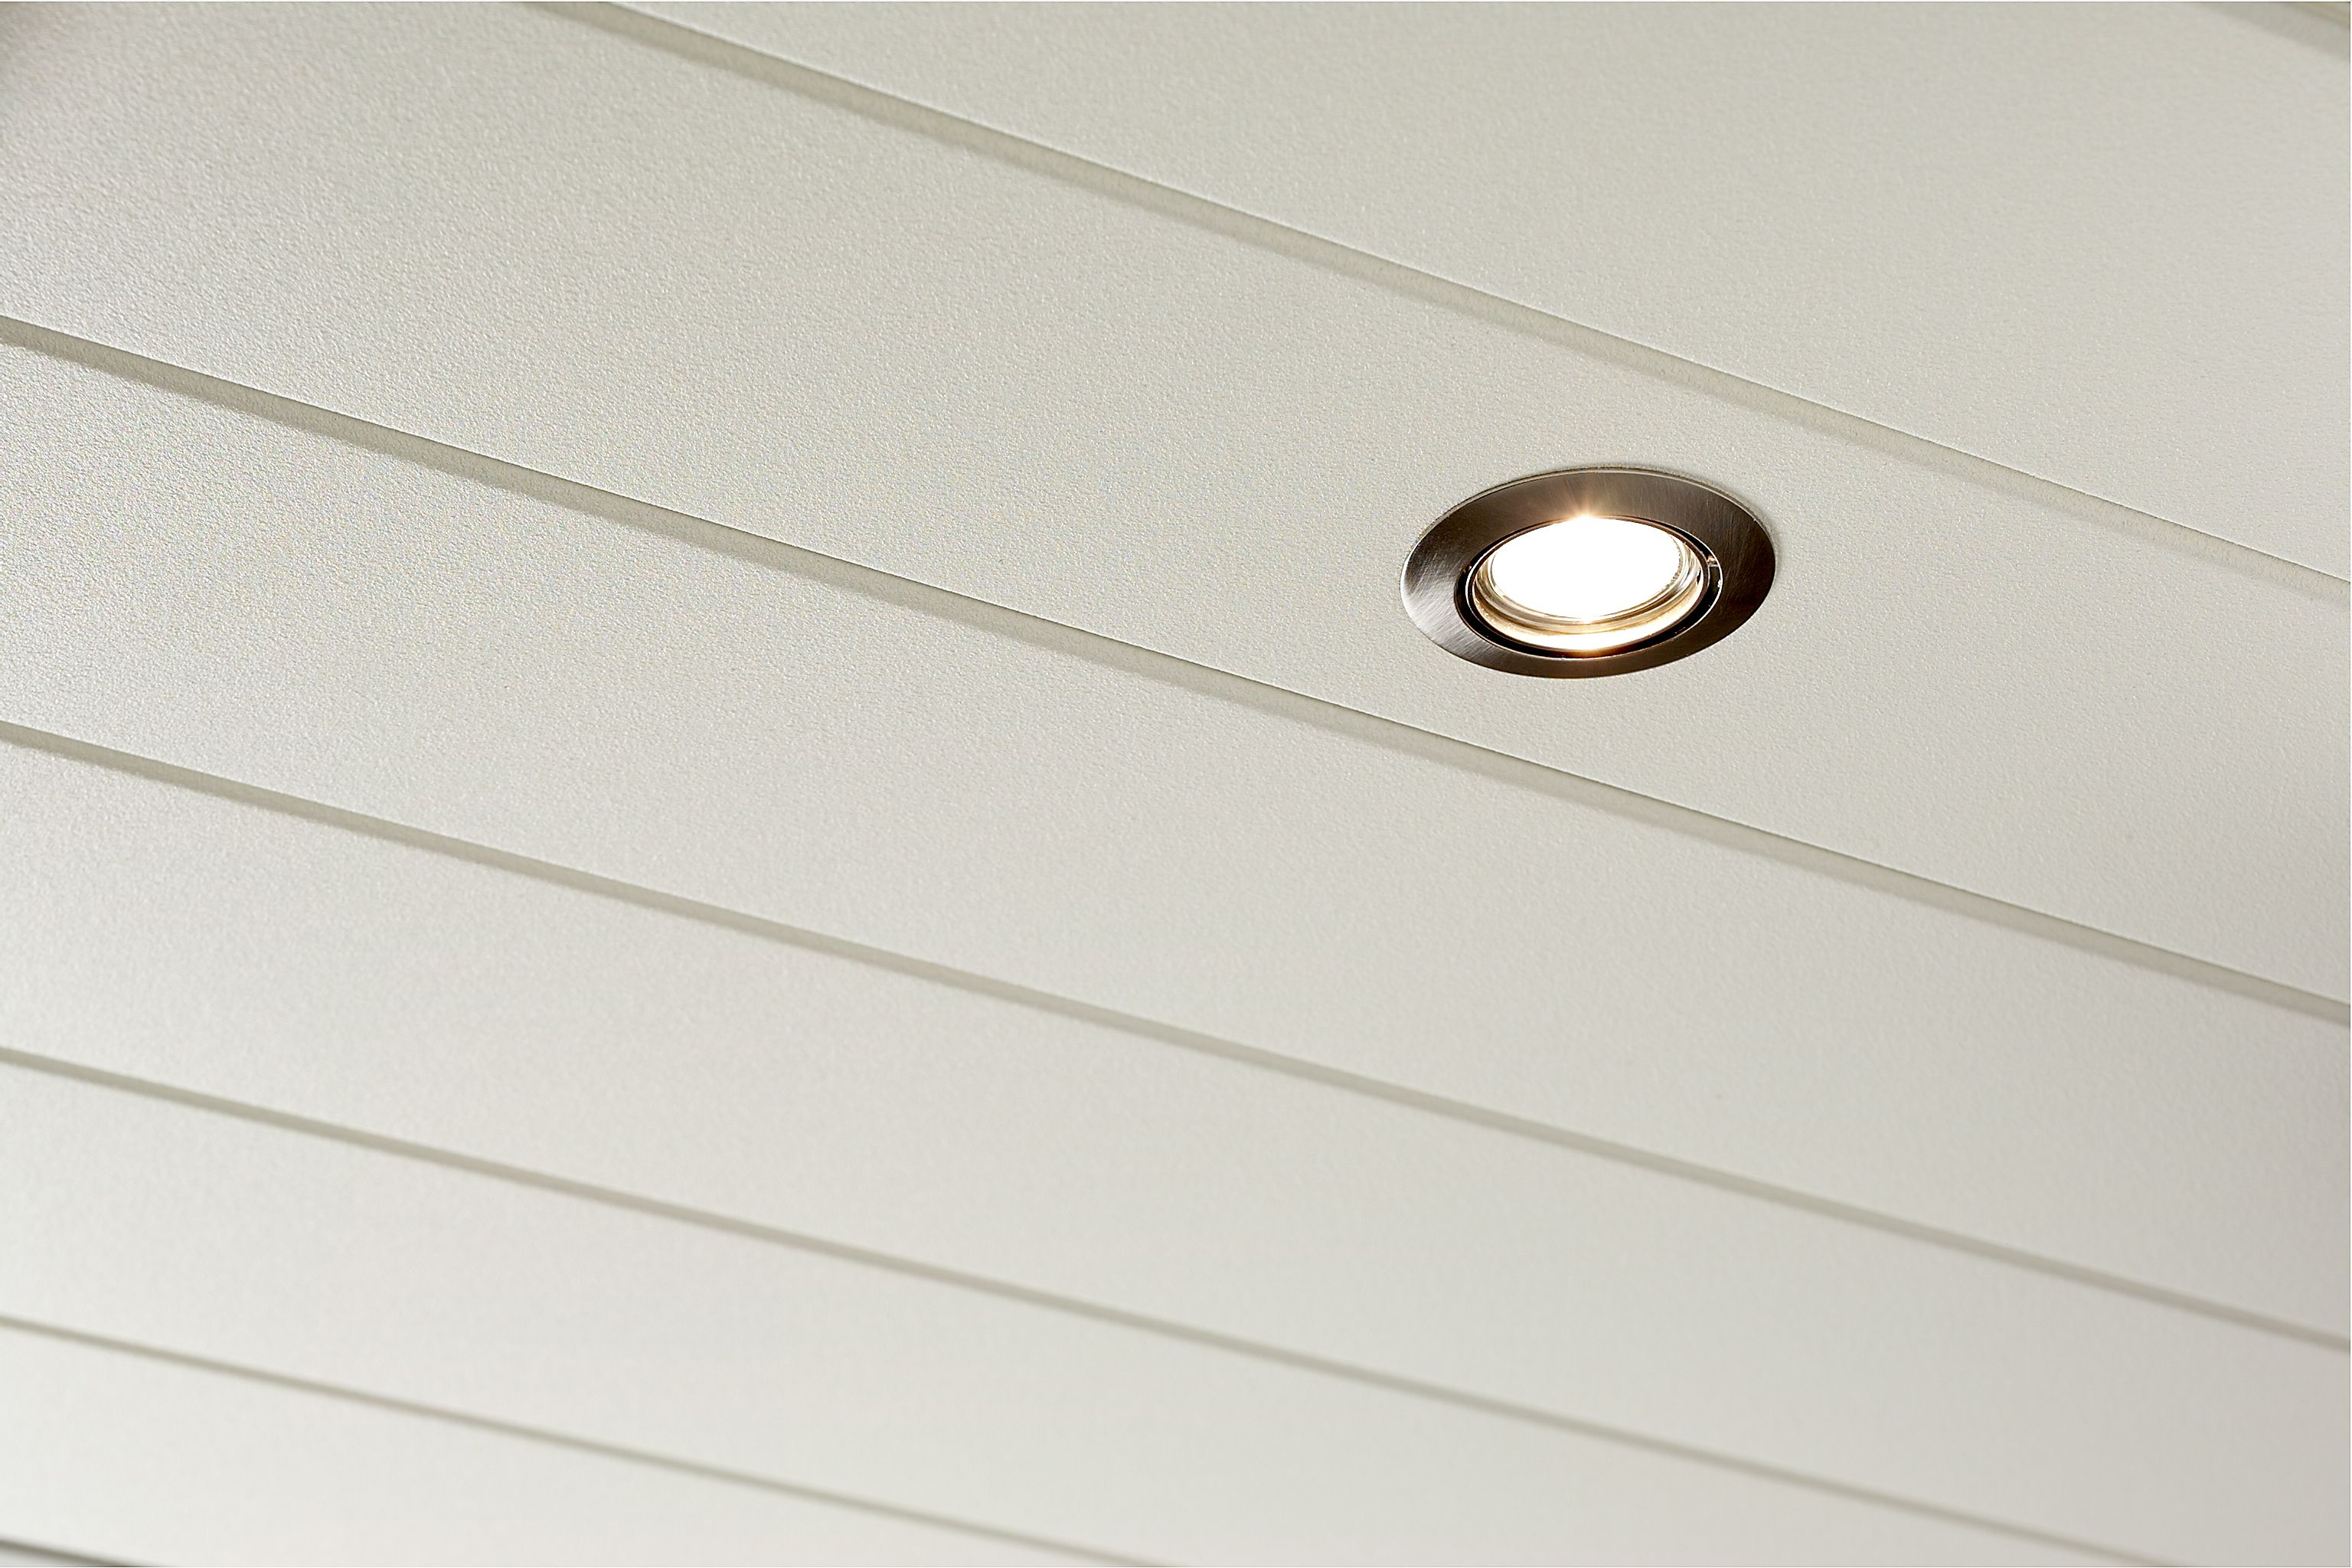 aluminium luxalon badkamer plafond met ingebouwde led